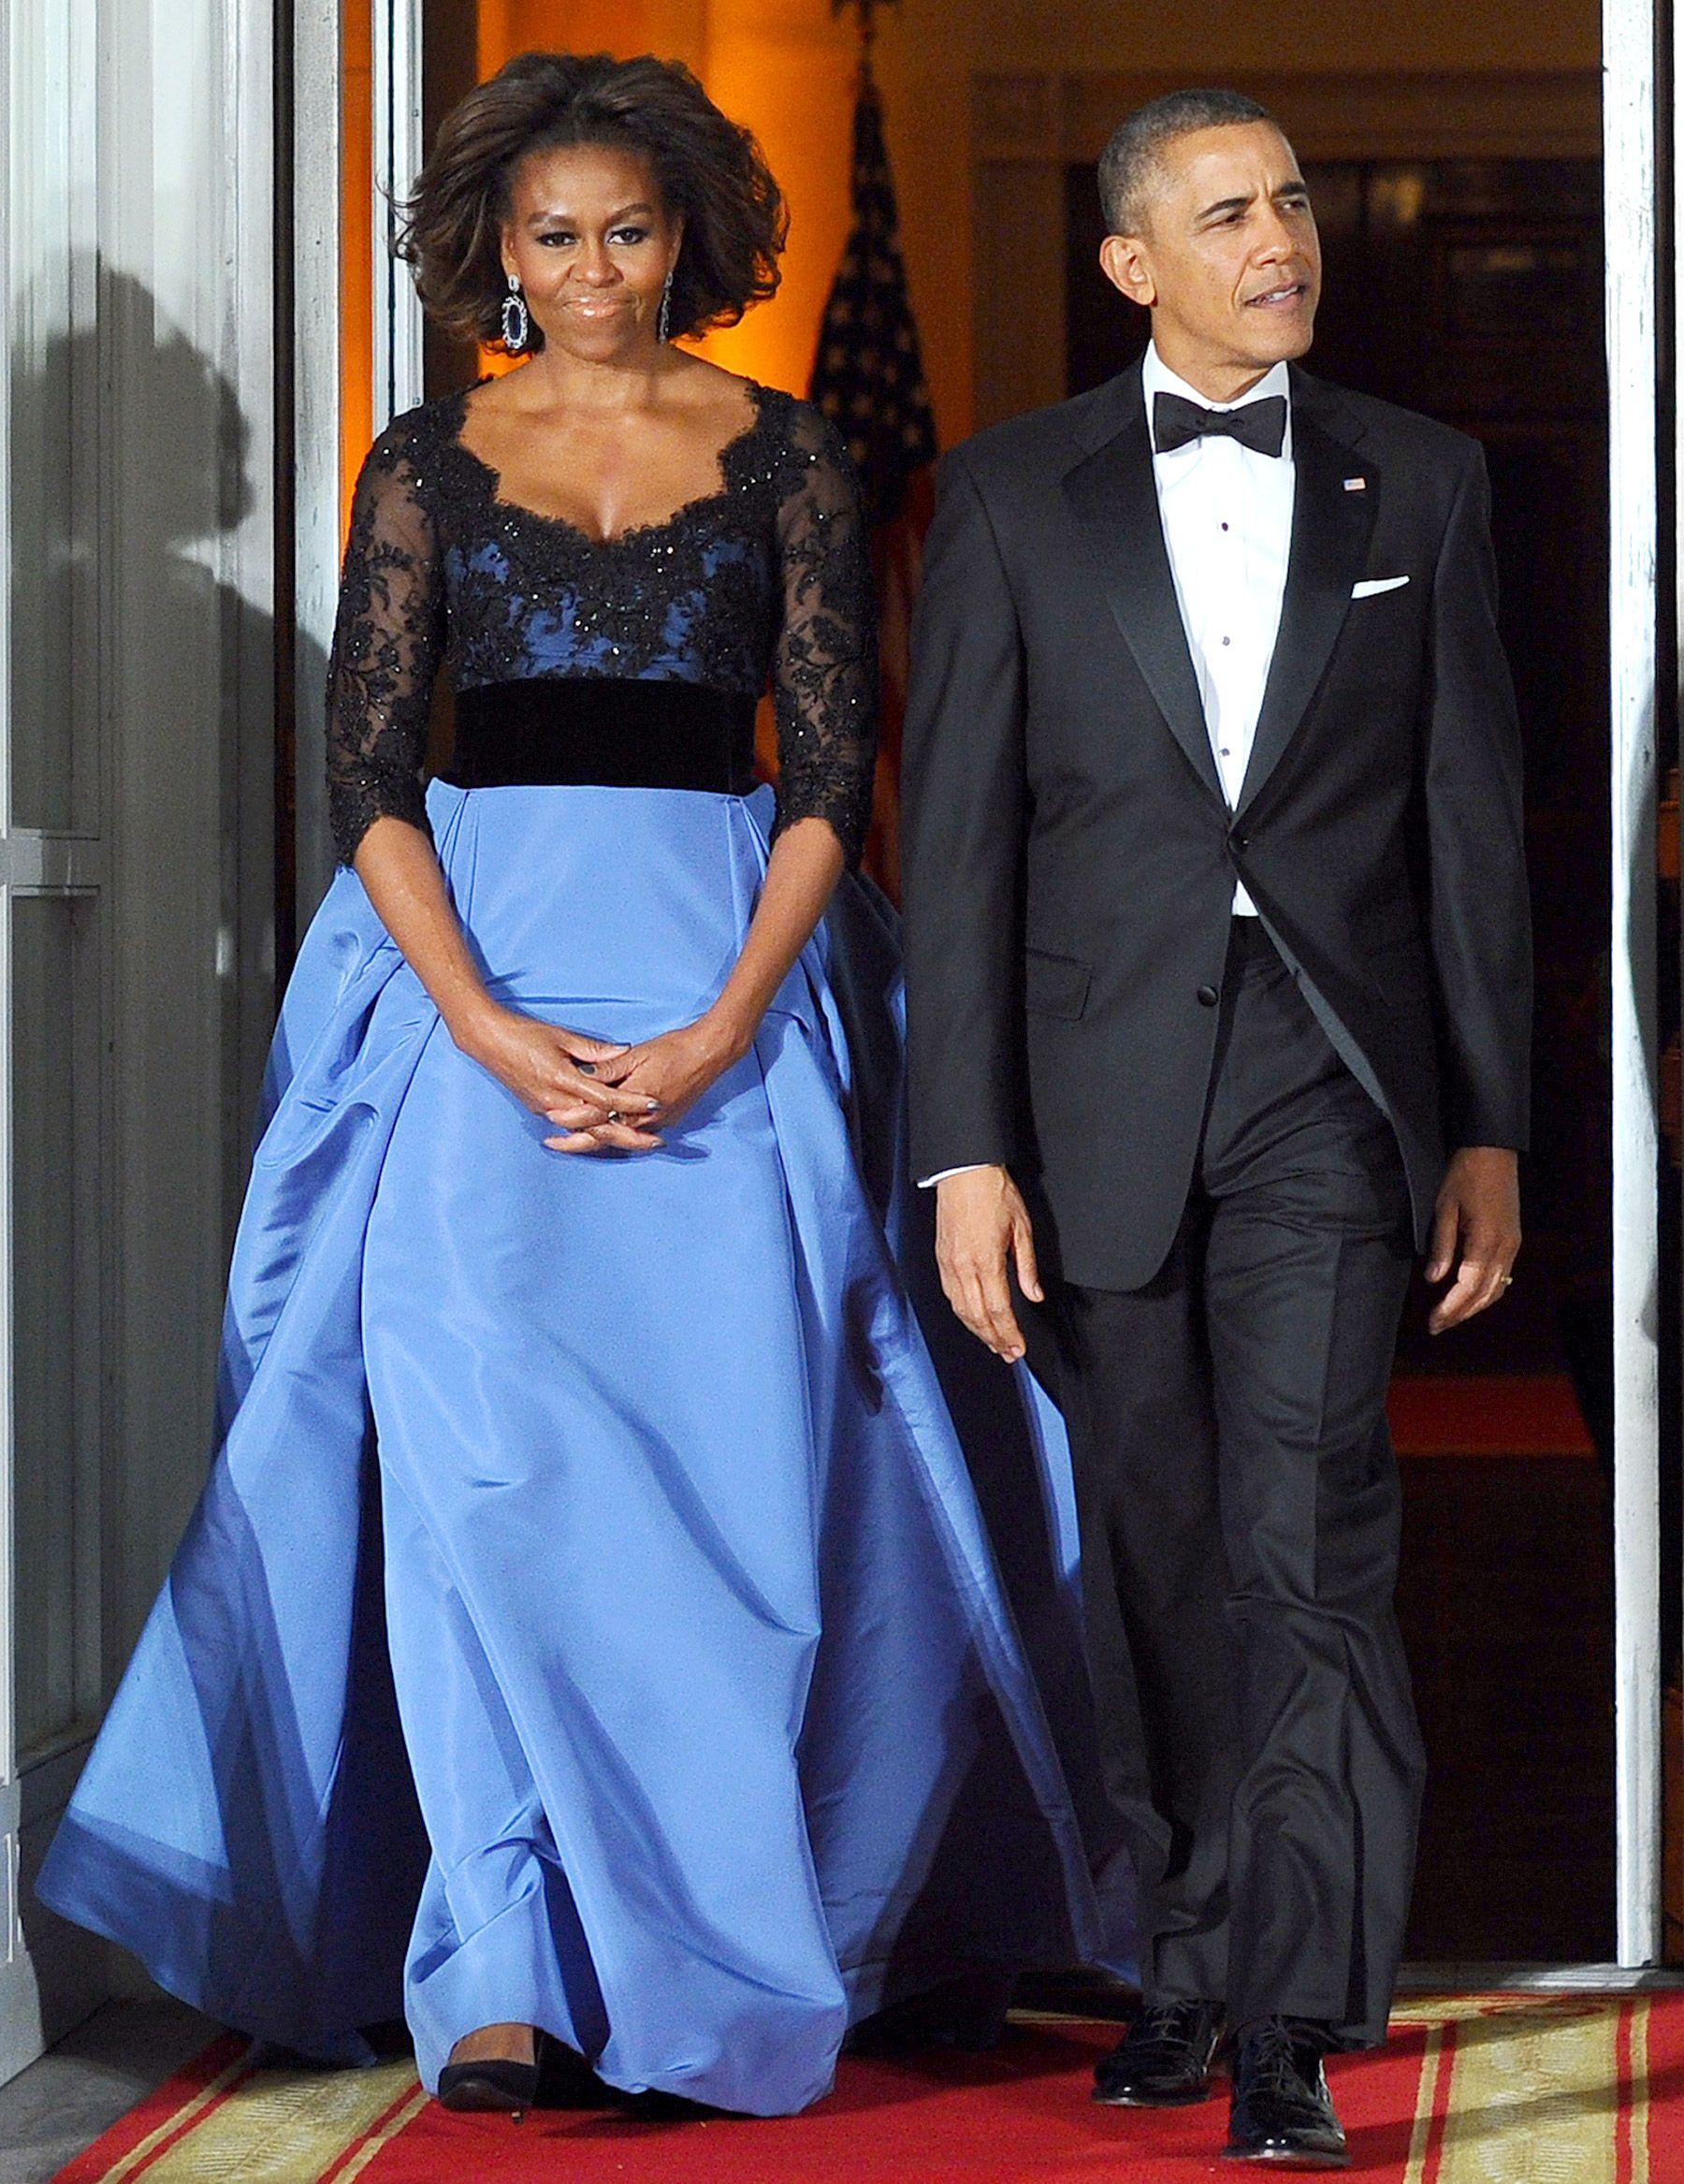 Michelle Obama Wears Carolina Herrera Gown to State Dinner.  Stunning!